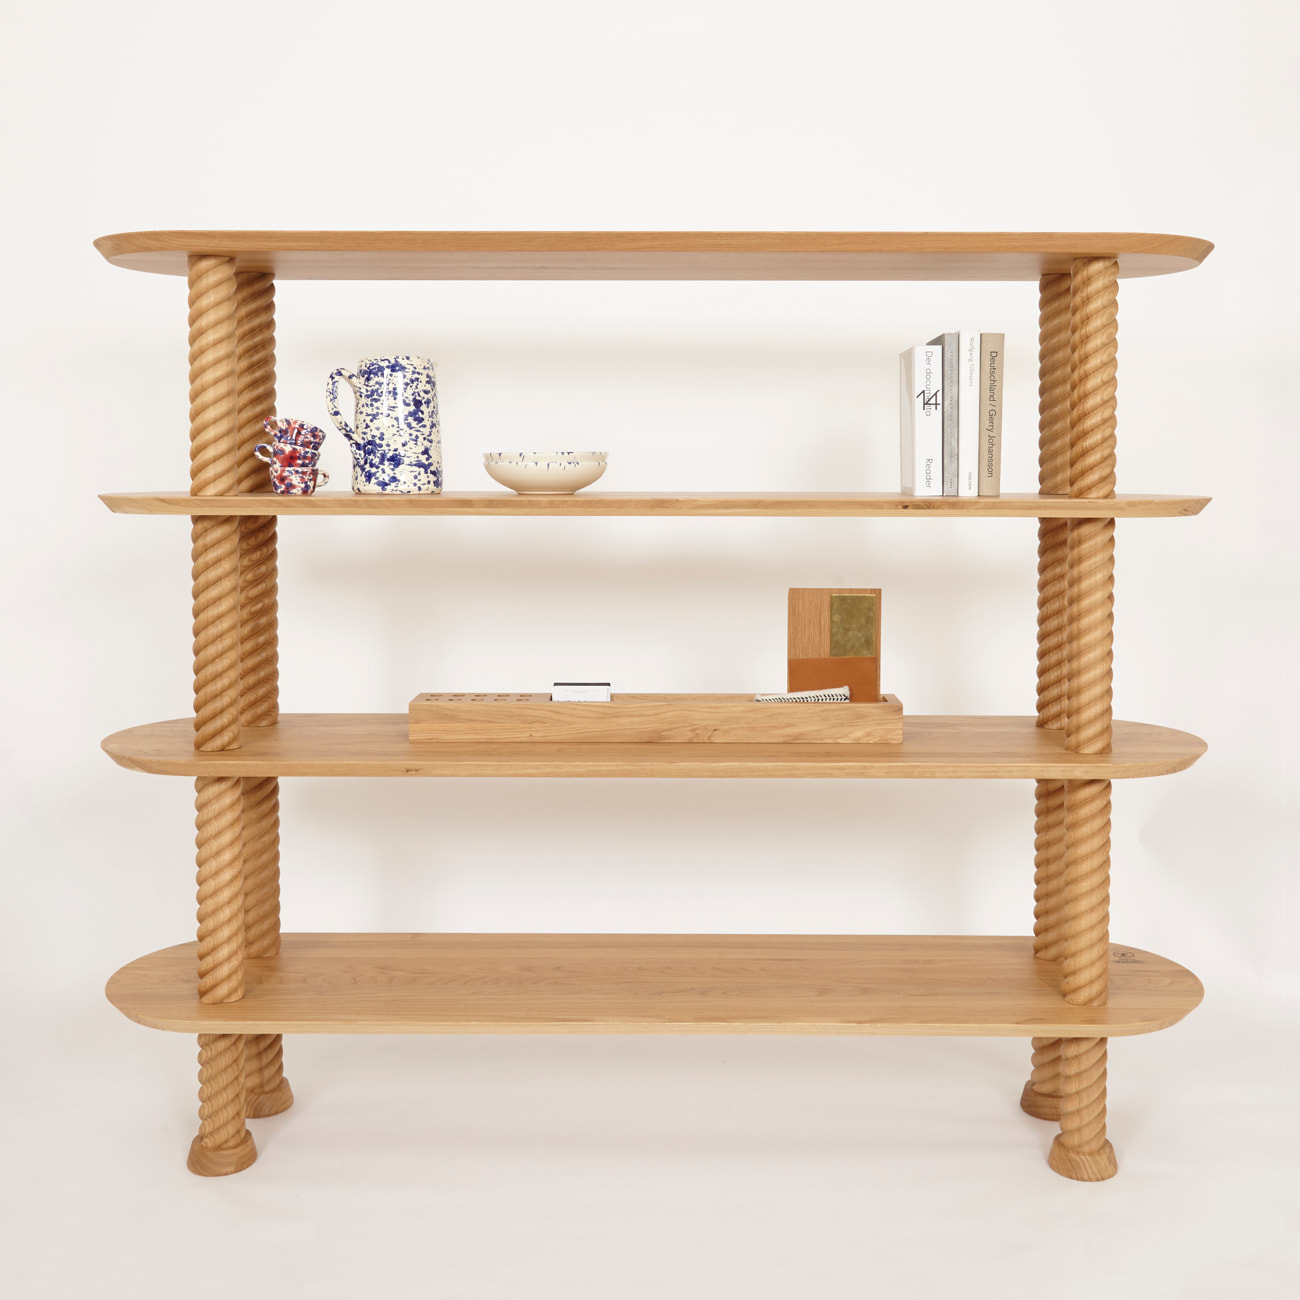 furniture-remix-rope-shelf-the-hansen-family-2